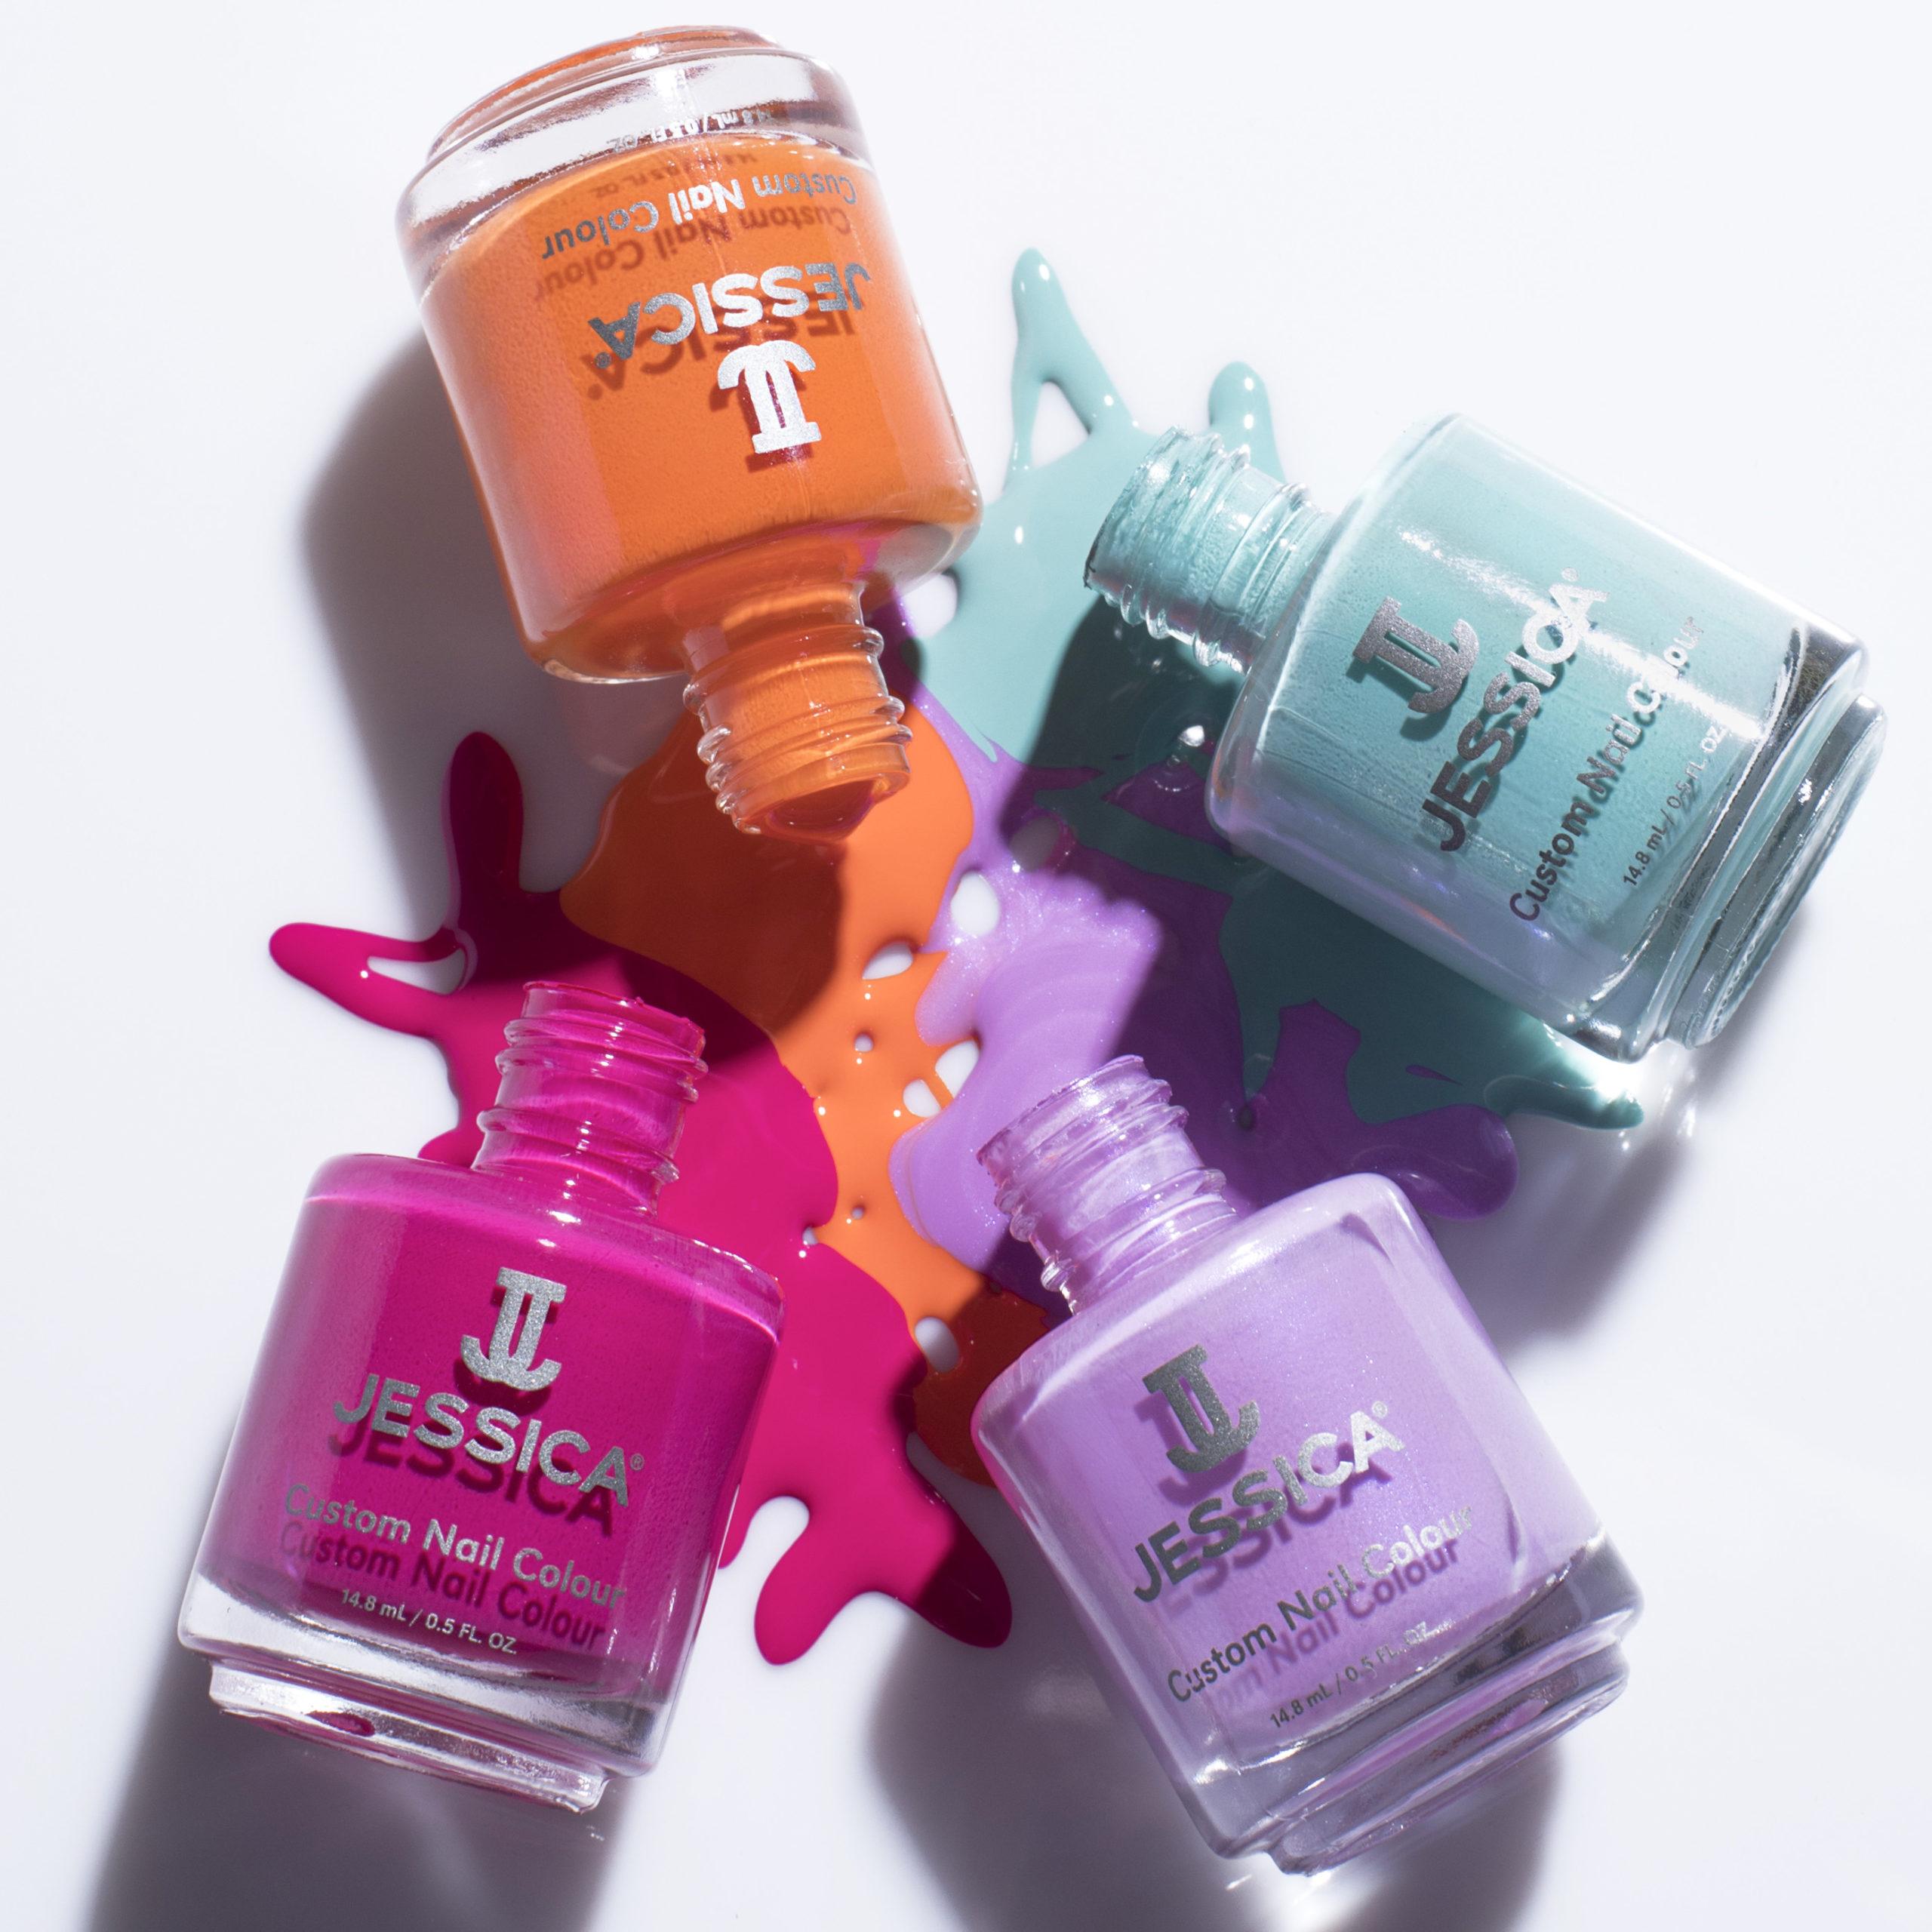 Jessica Custom Colour Nail Polish group shot